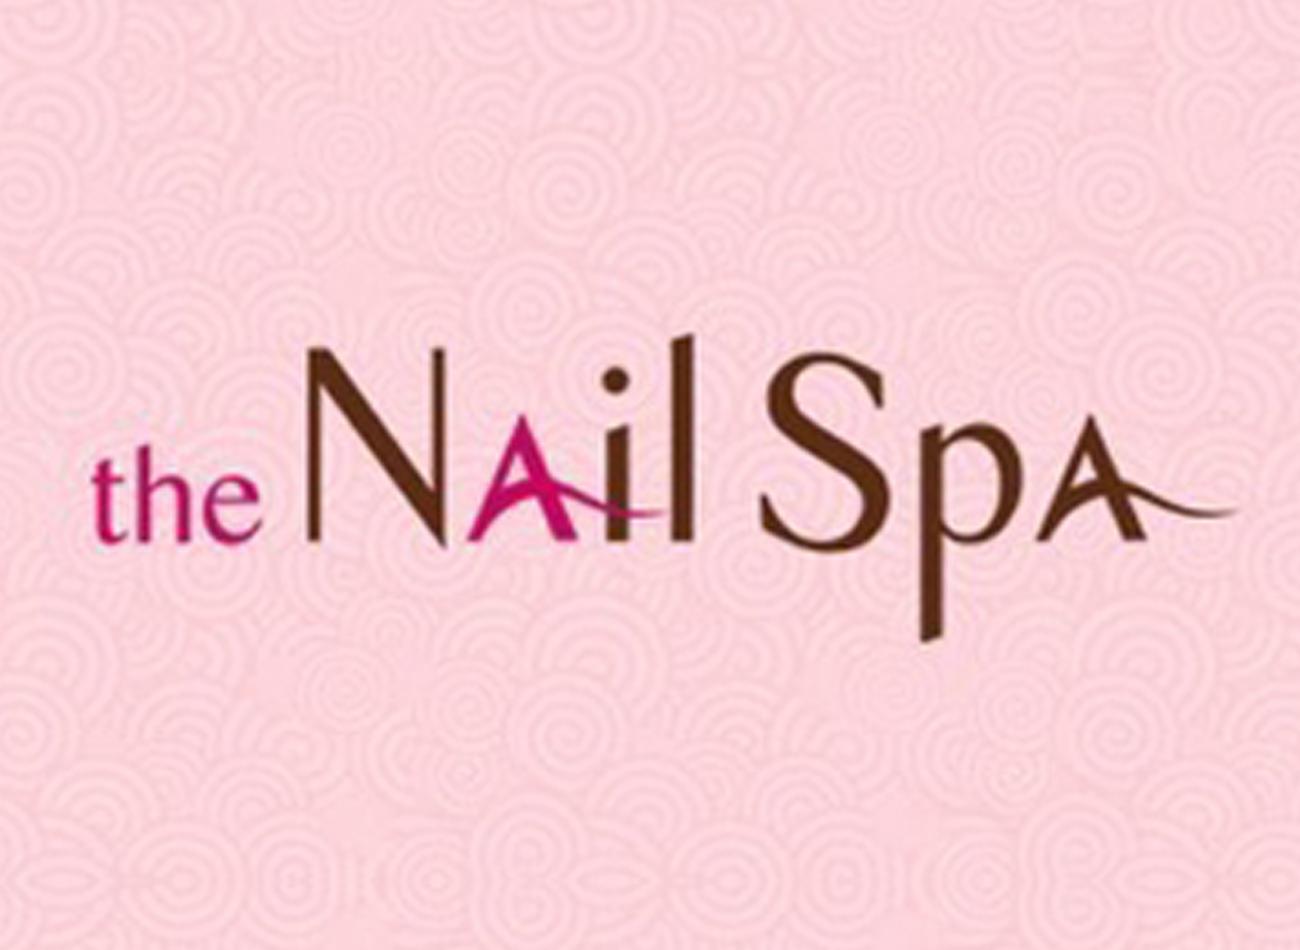 logo-the-nail-spa-agent-orange-design-creative-agency-johannesburg-branding.jpg